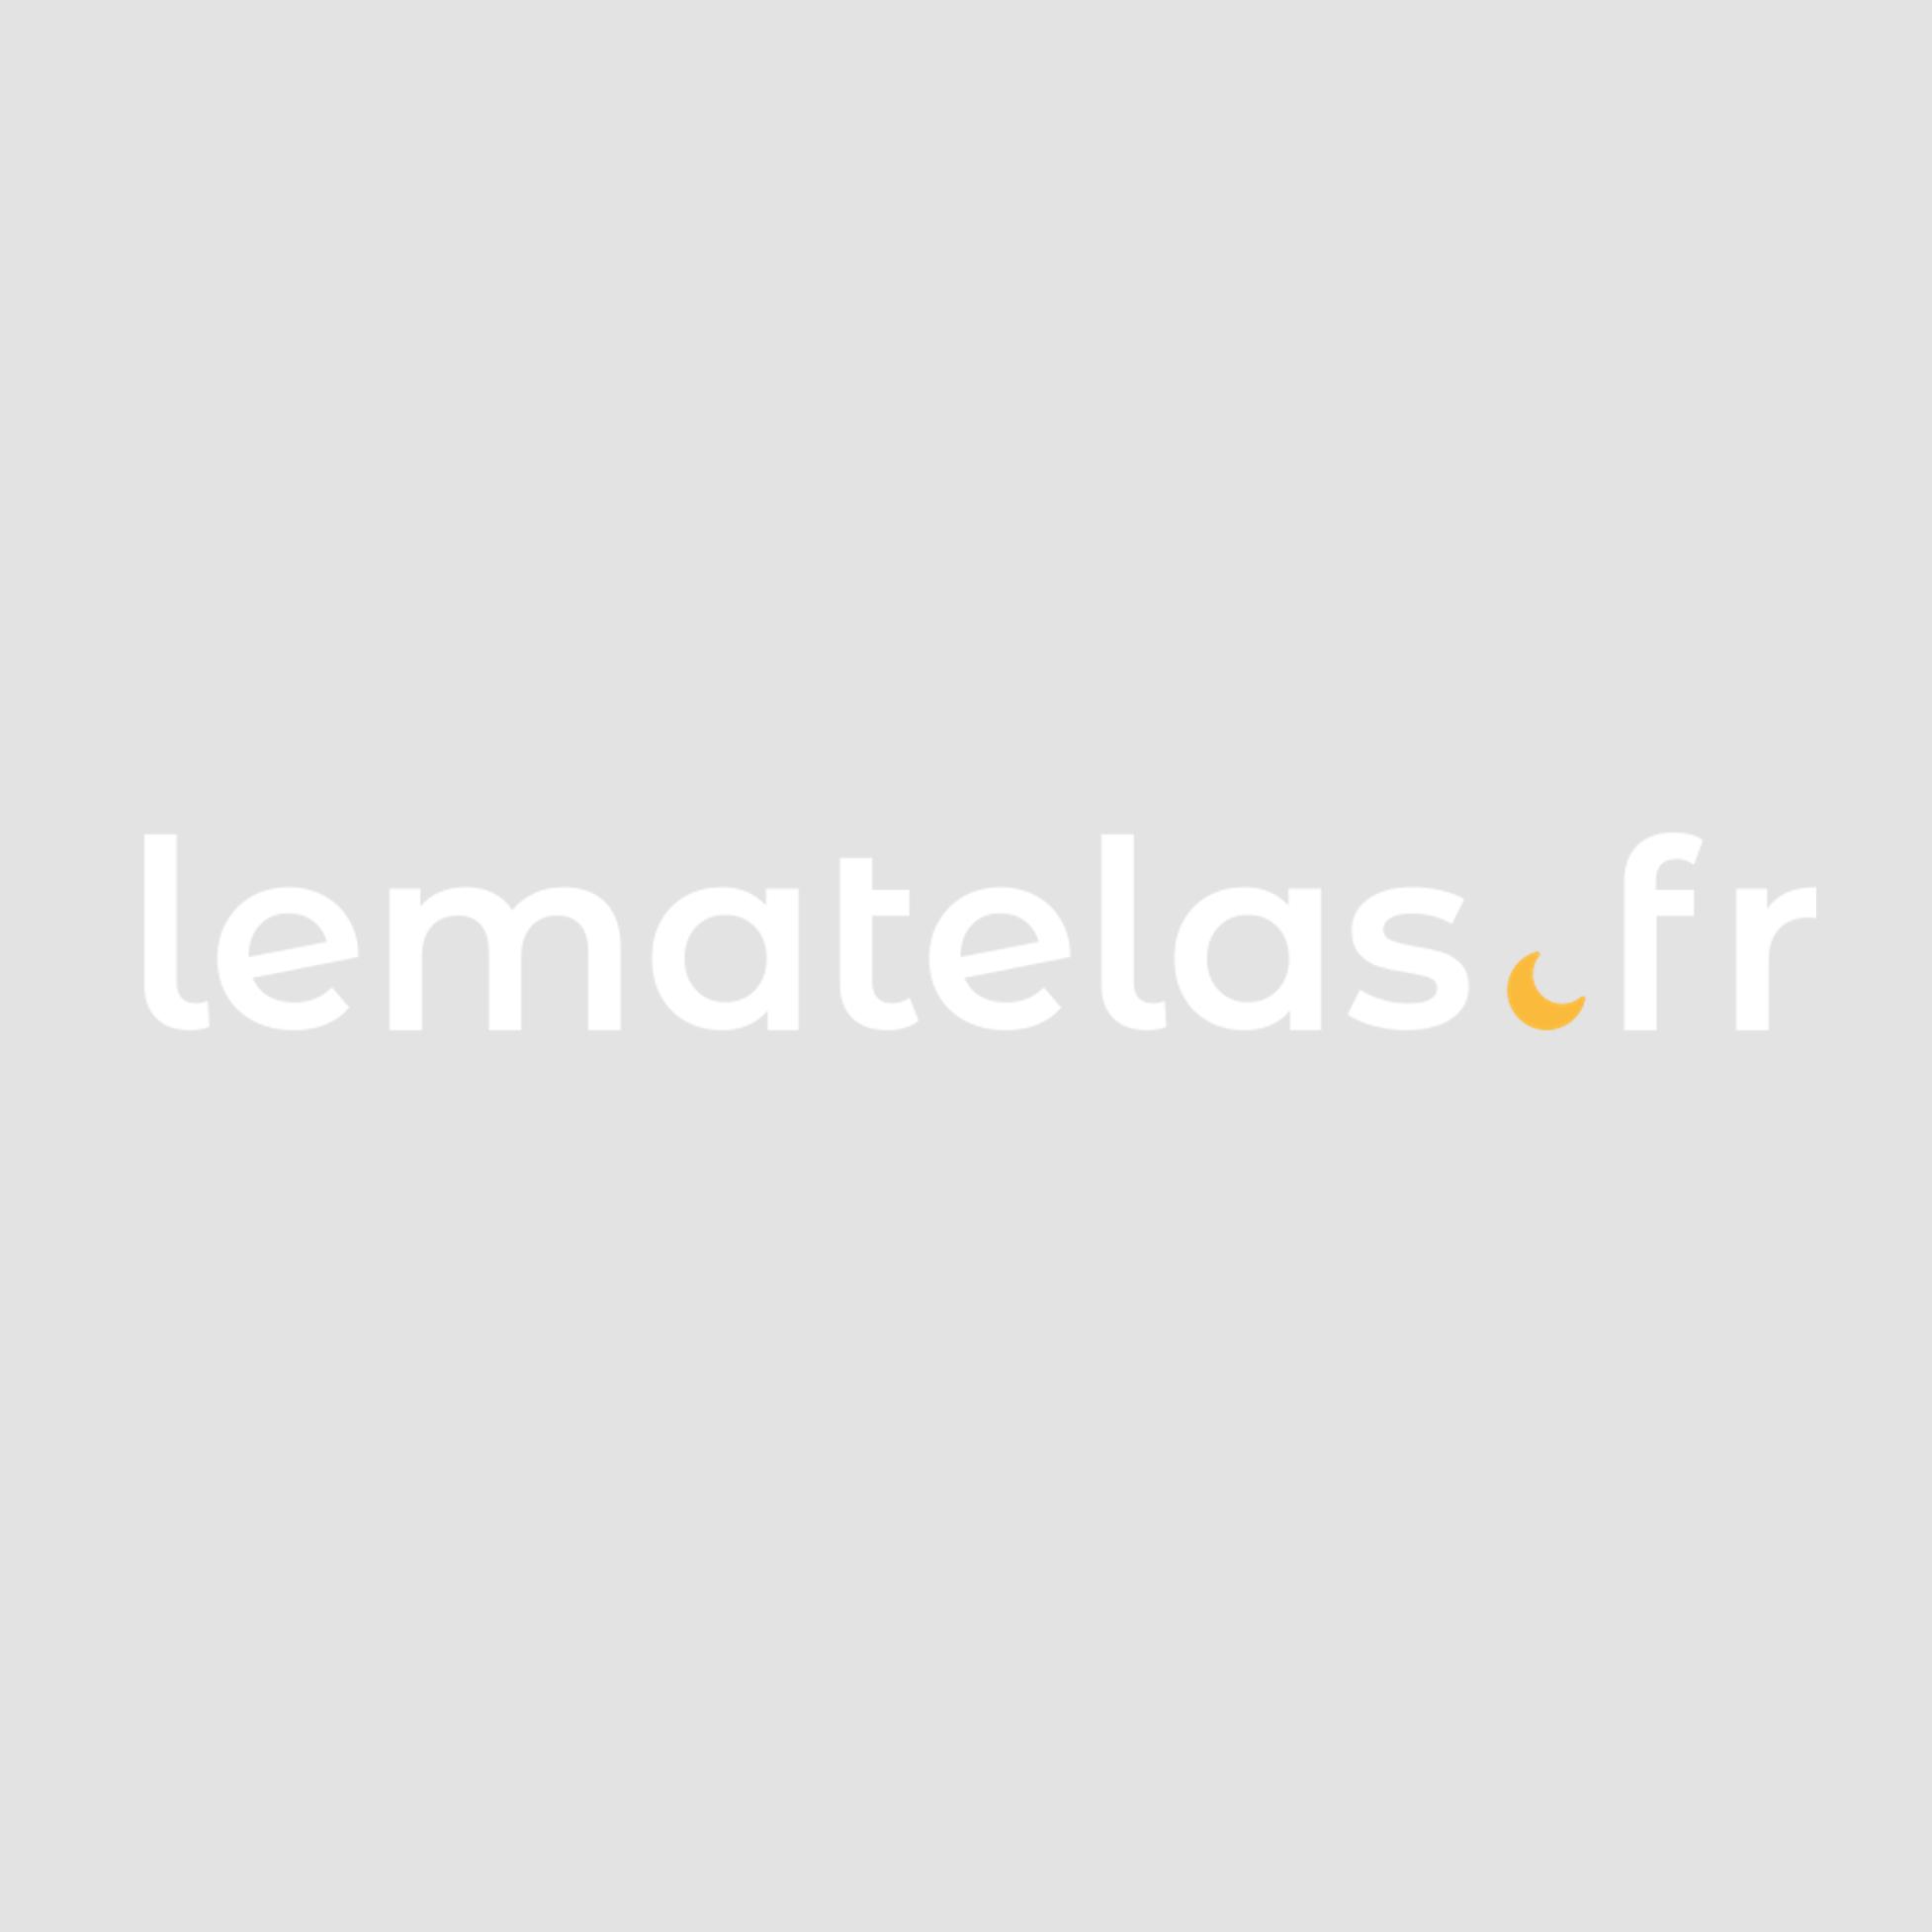 simmons matelas starissimm 26 cm 140 x 190 cm. Black Bedroom Furniture Sets. Home Design Ideas